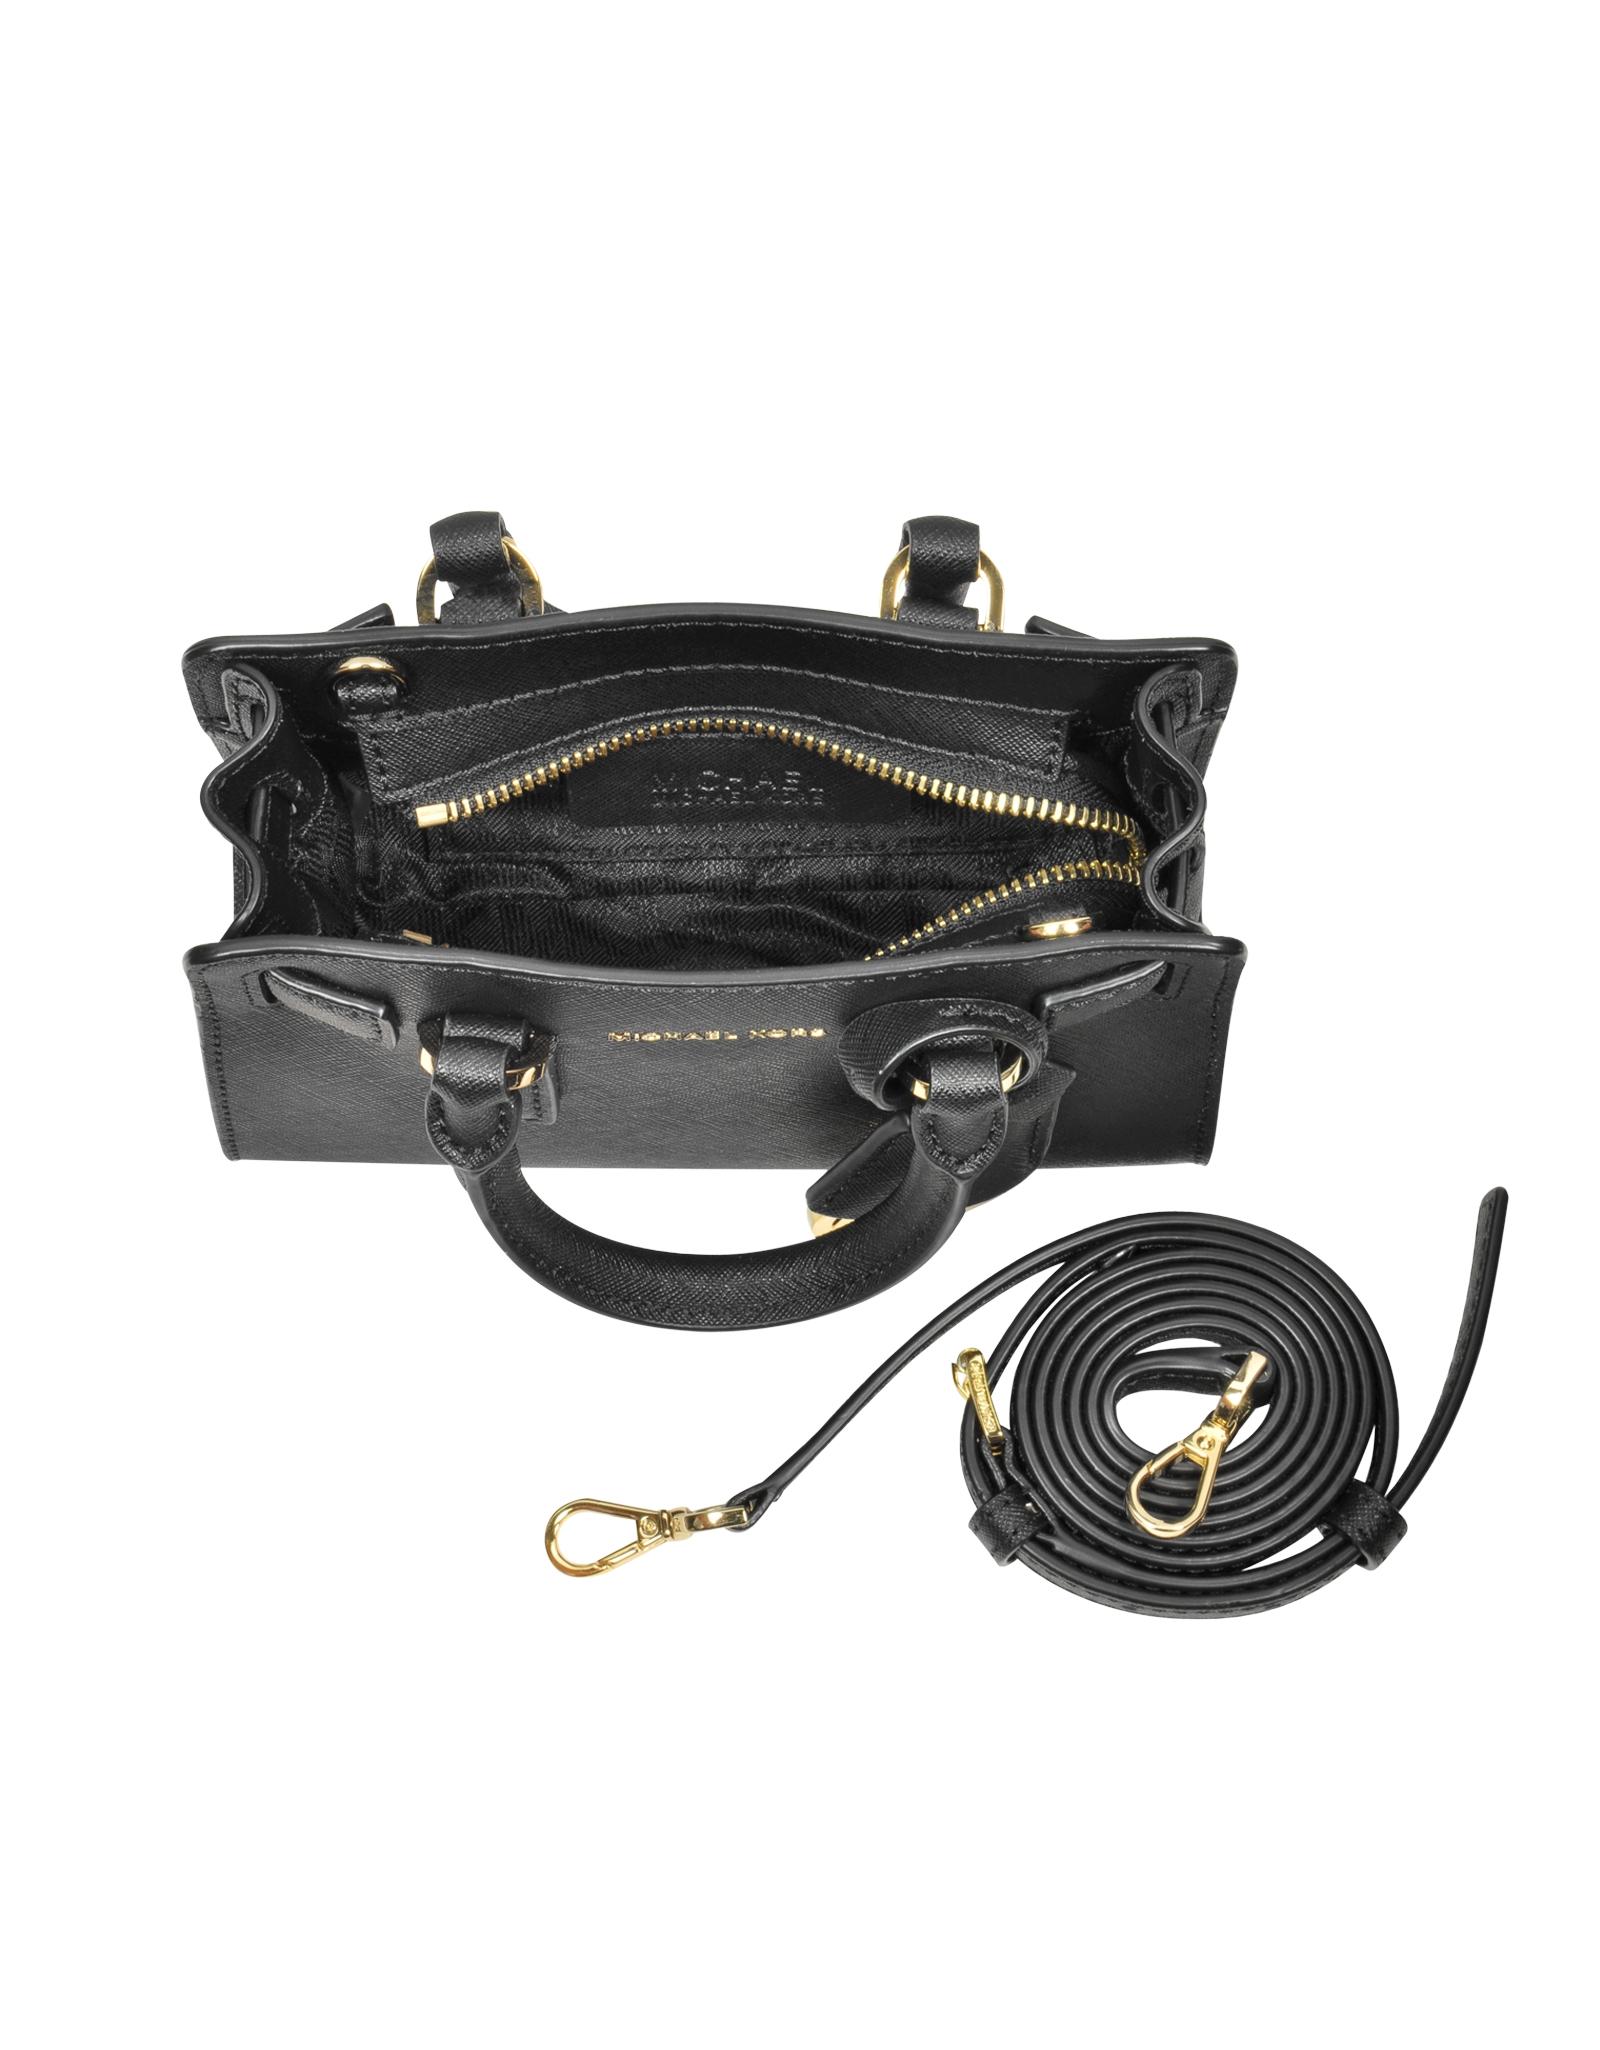 1752b7440123 Lyst - Michael Kors Dillon Black Saffiano Leather Extra Small ...